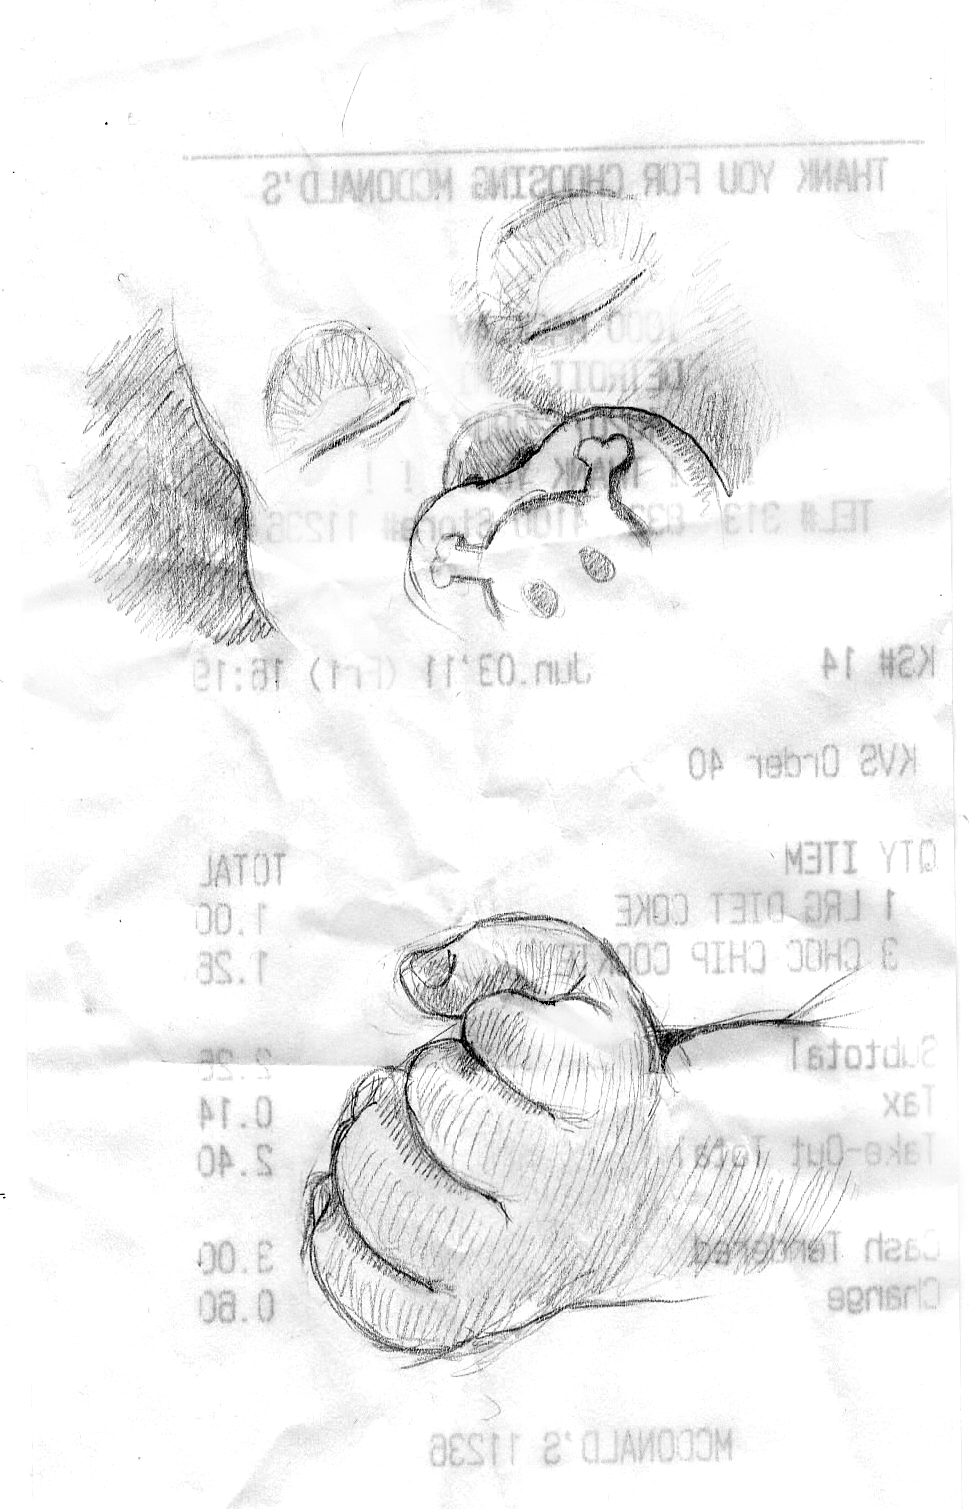 magnus_hand&bink_face.JPG